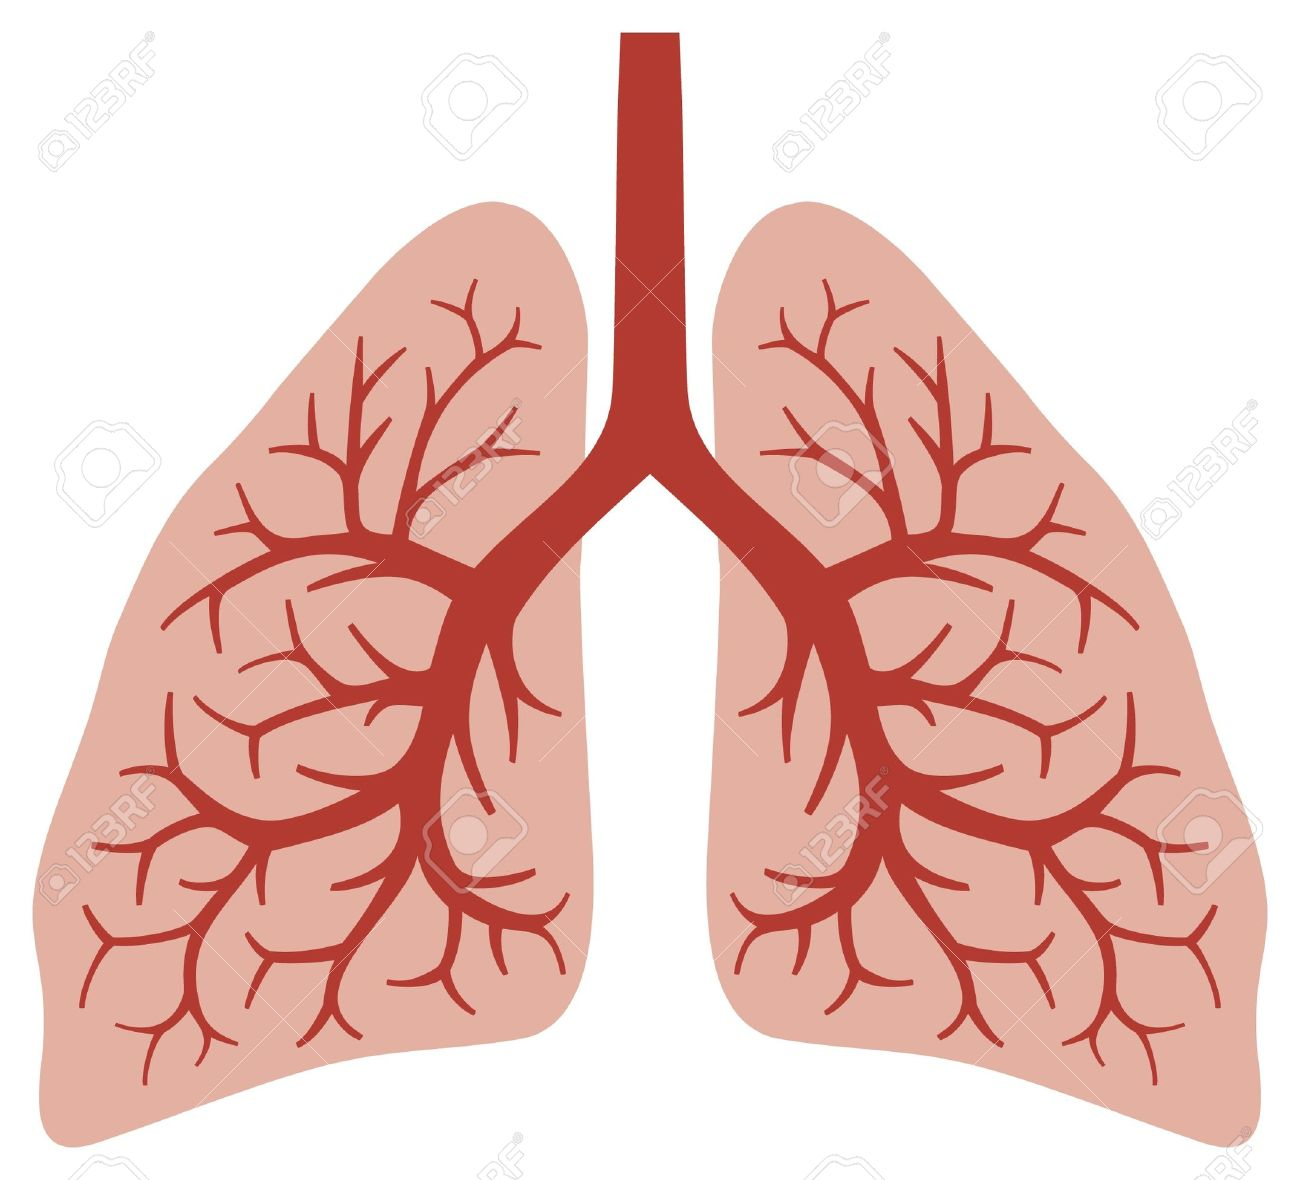 human lungs bronchial system, human organs, lungs anatomy - 17470038